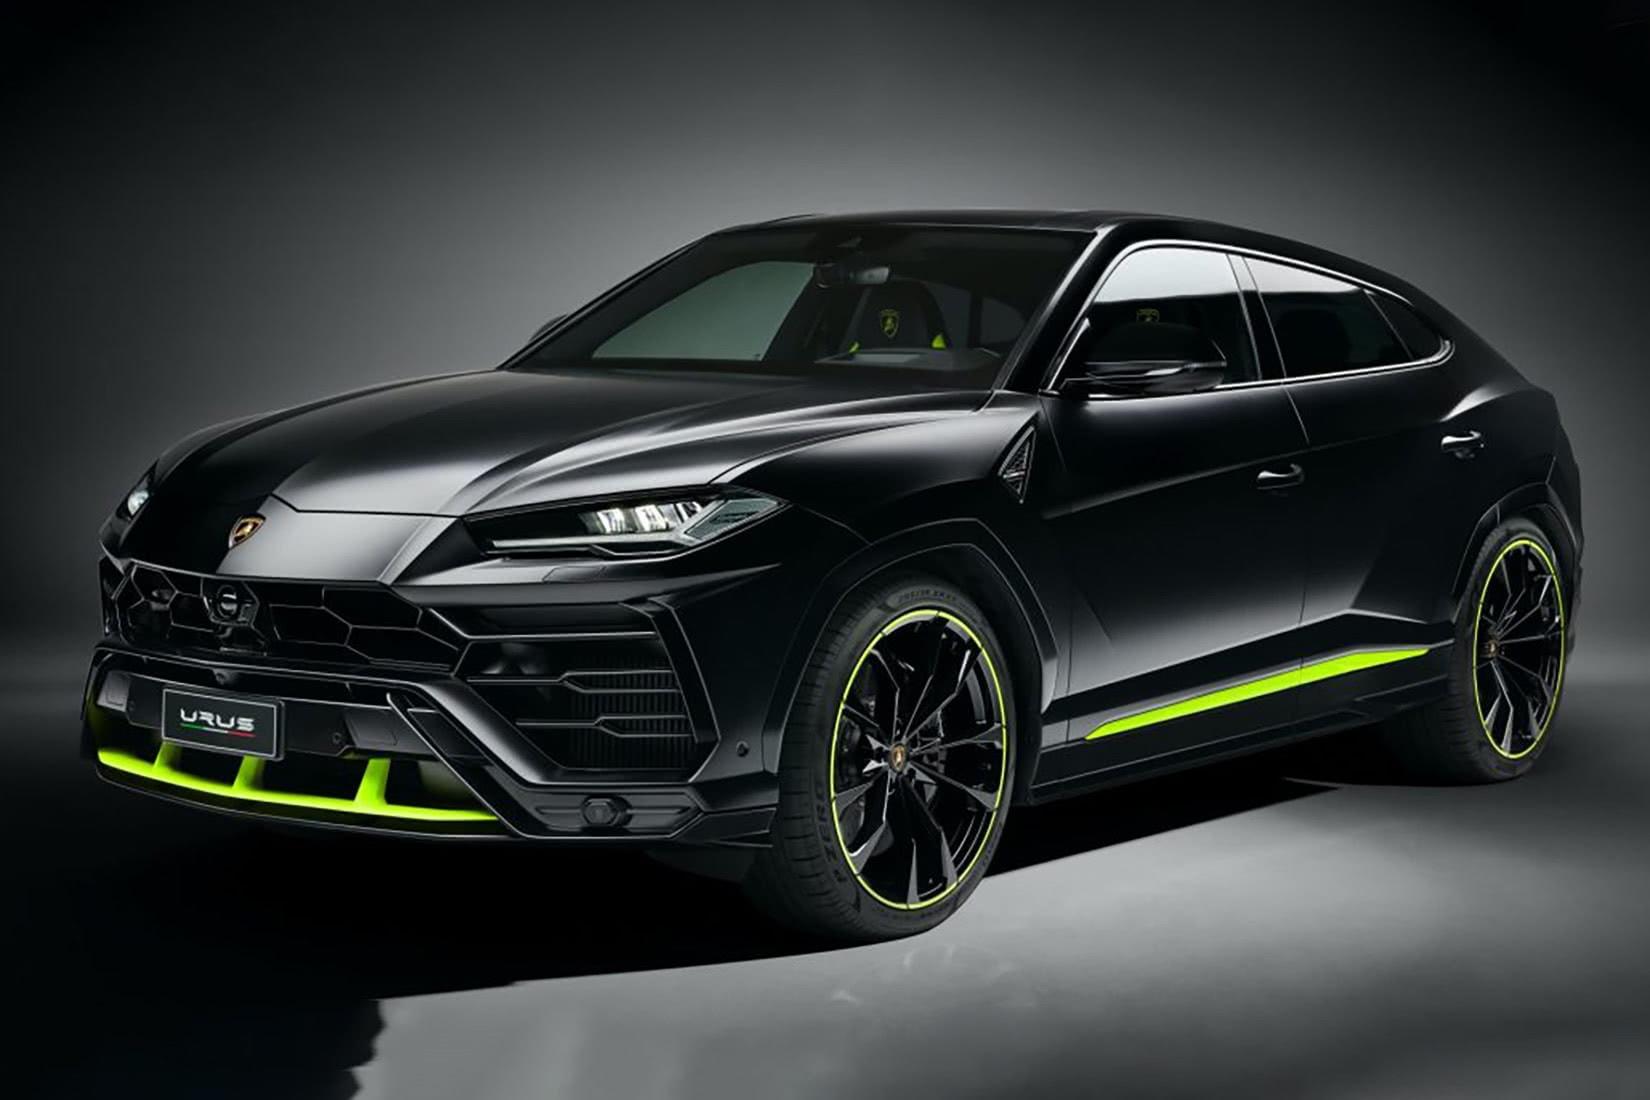 best luxury suv 2021 Lamborghini Urus - Luxe Digital